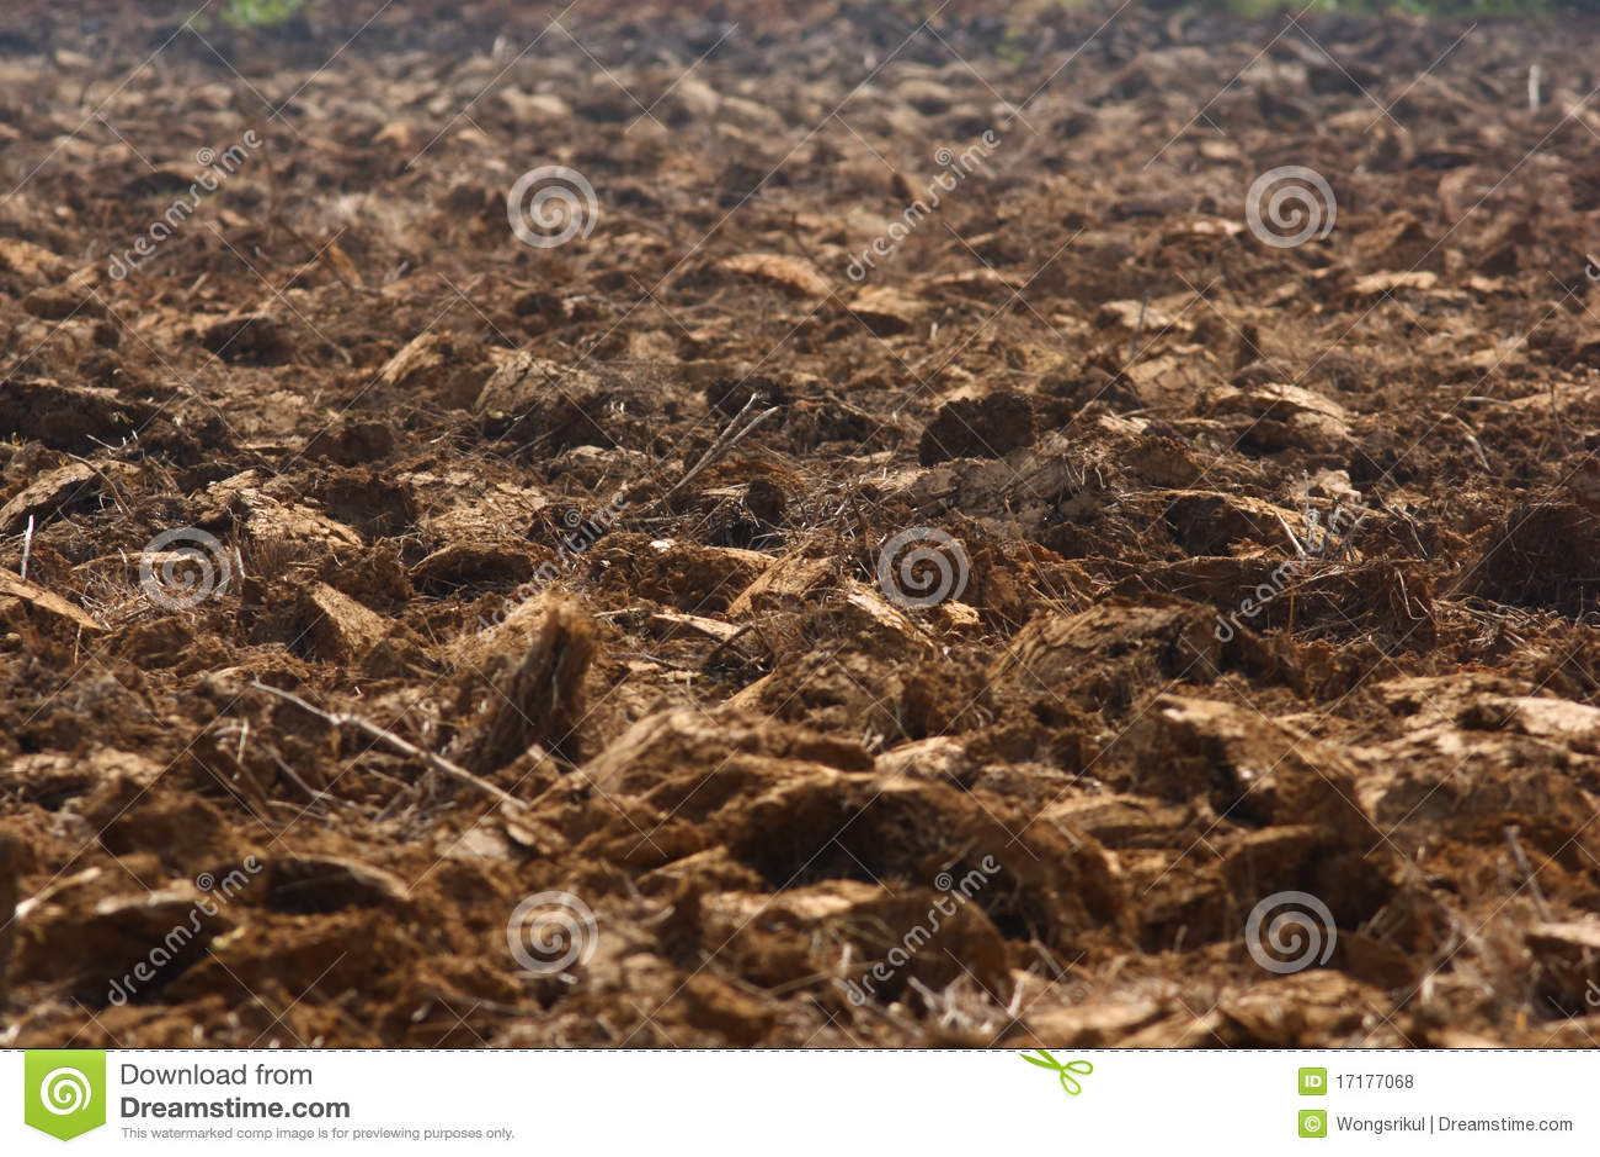 Soil royalty free stock photos image 17177068 for The soil 02joy